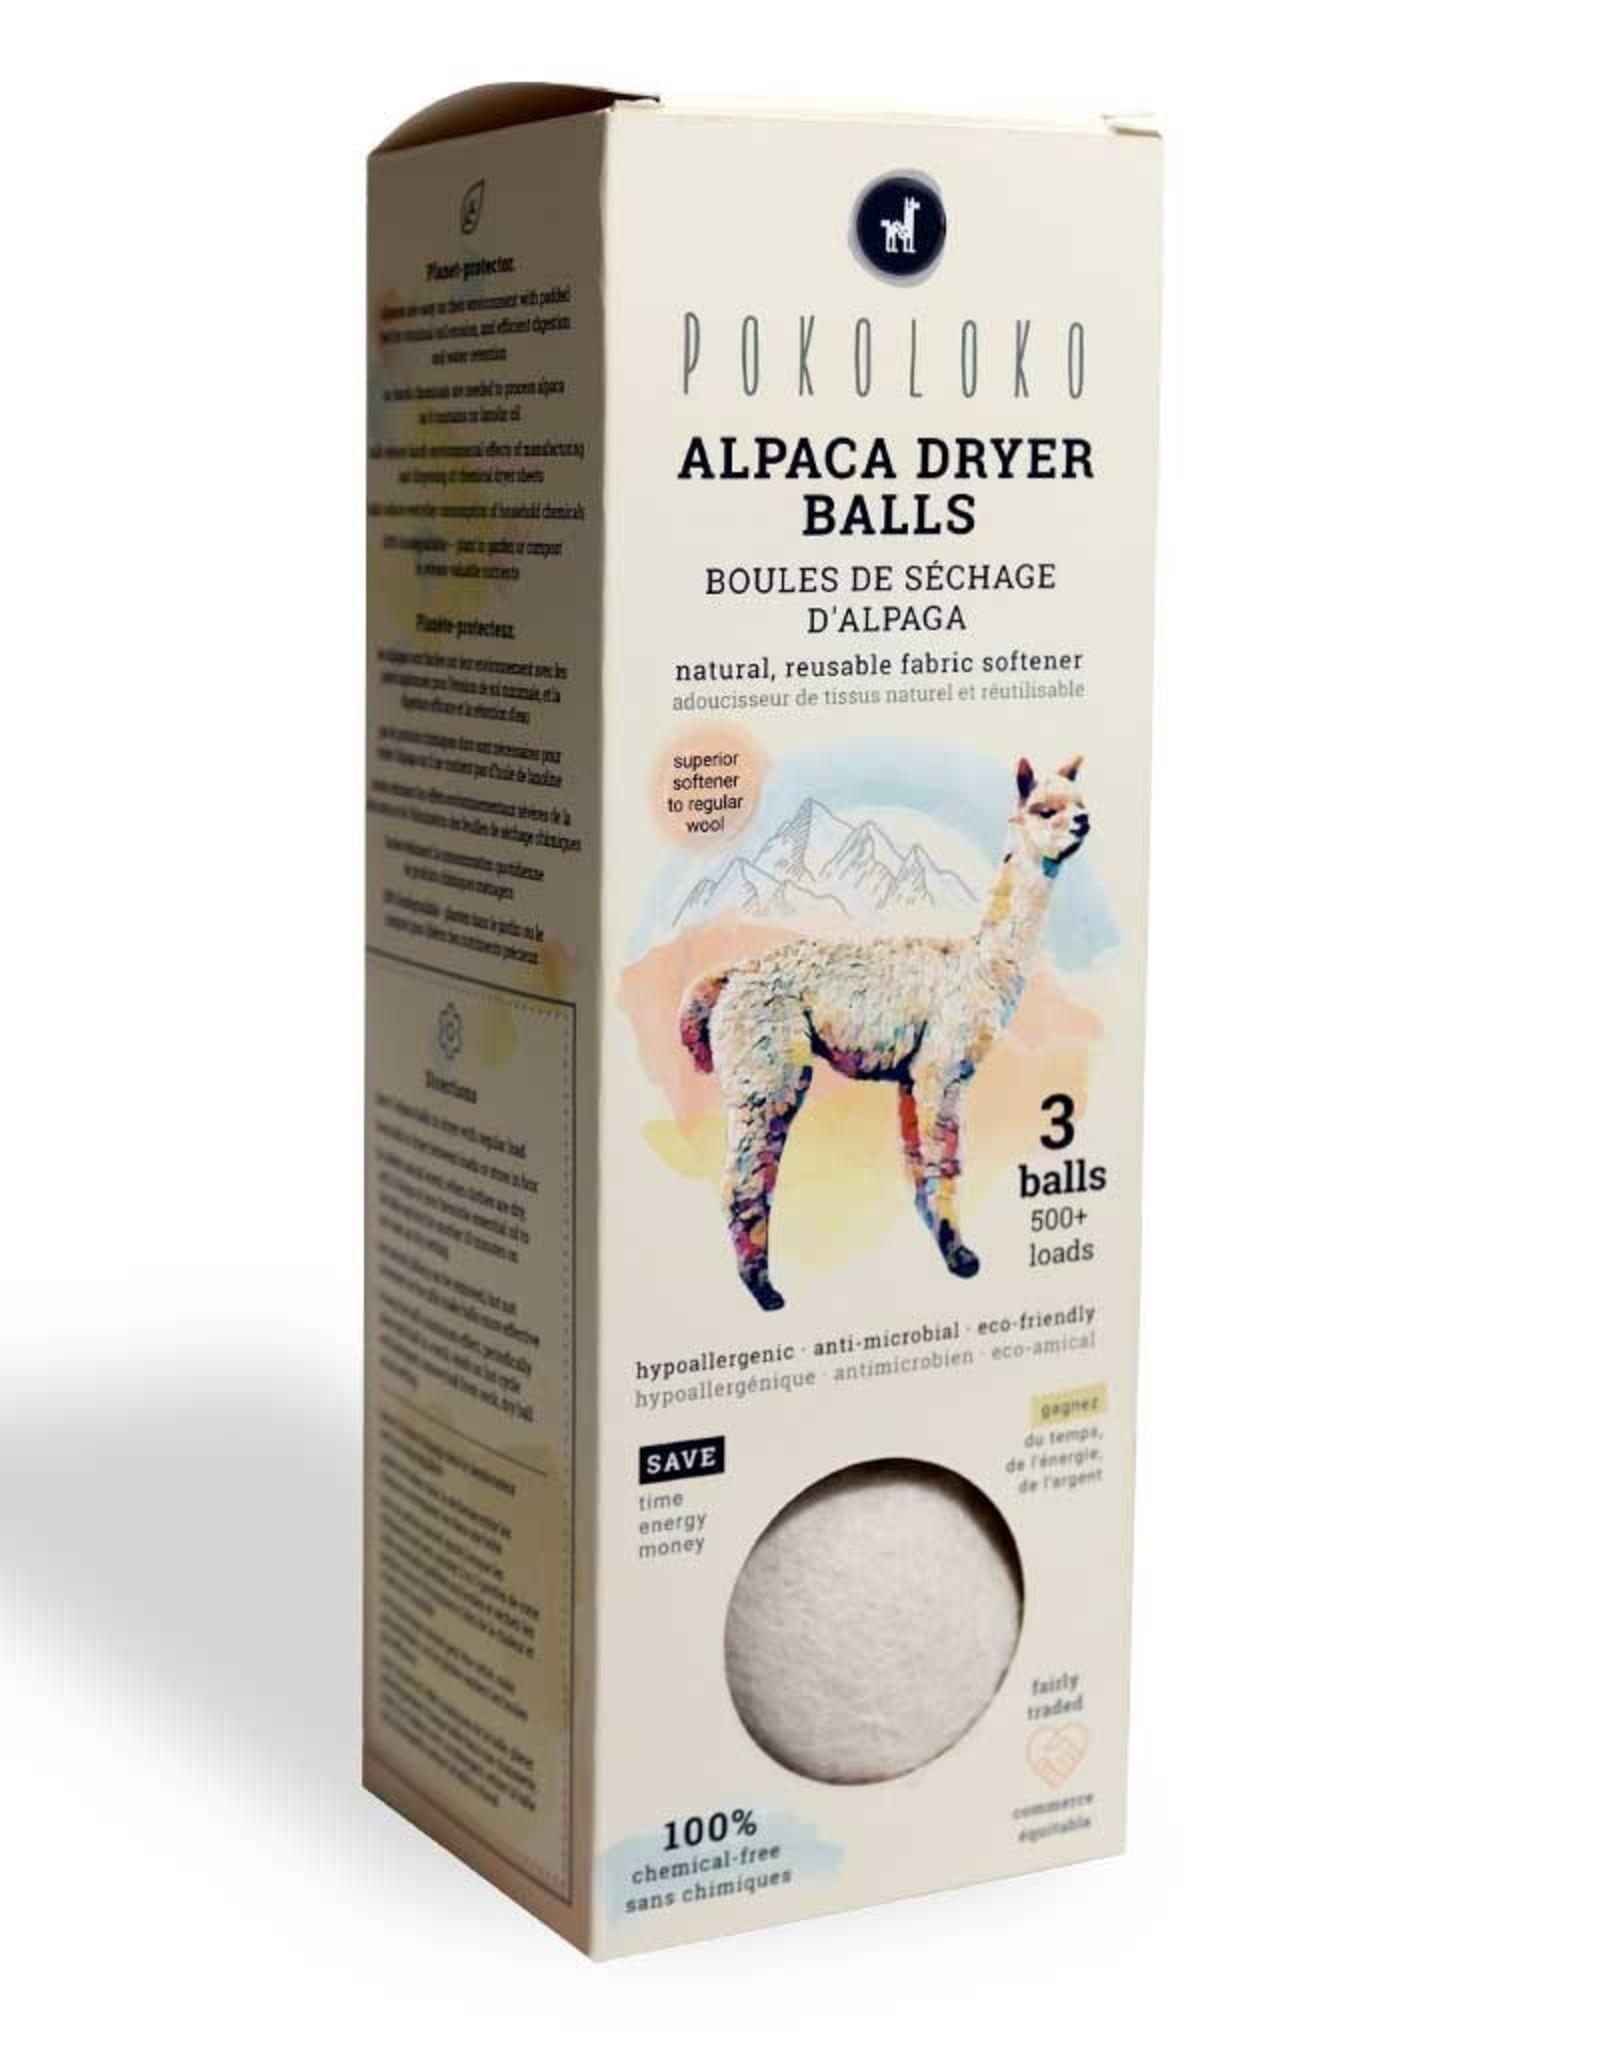 Pokoloko Alpaca Dryer Balls